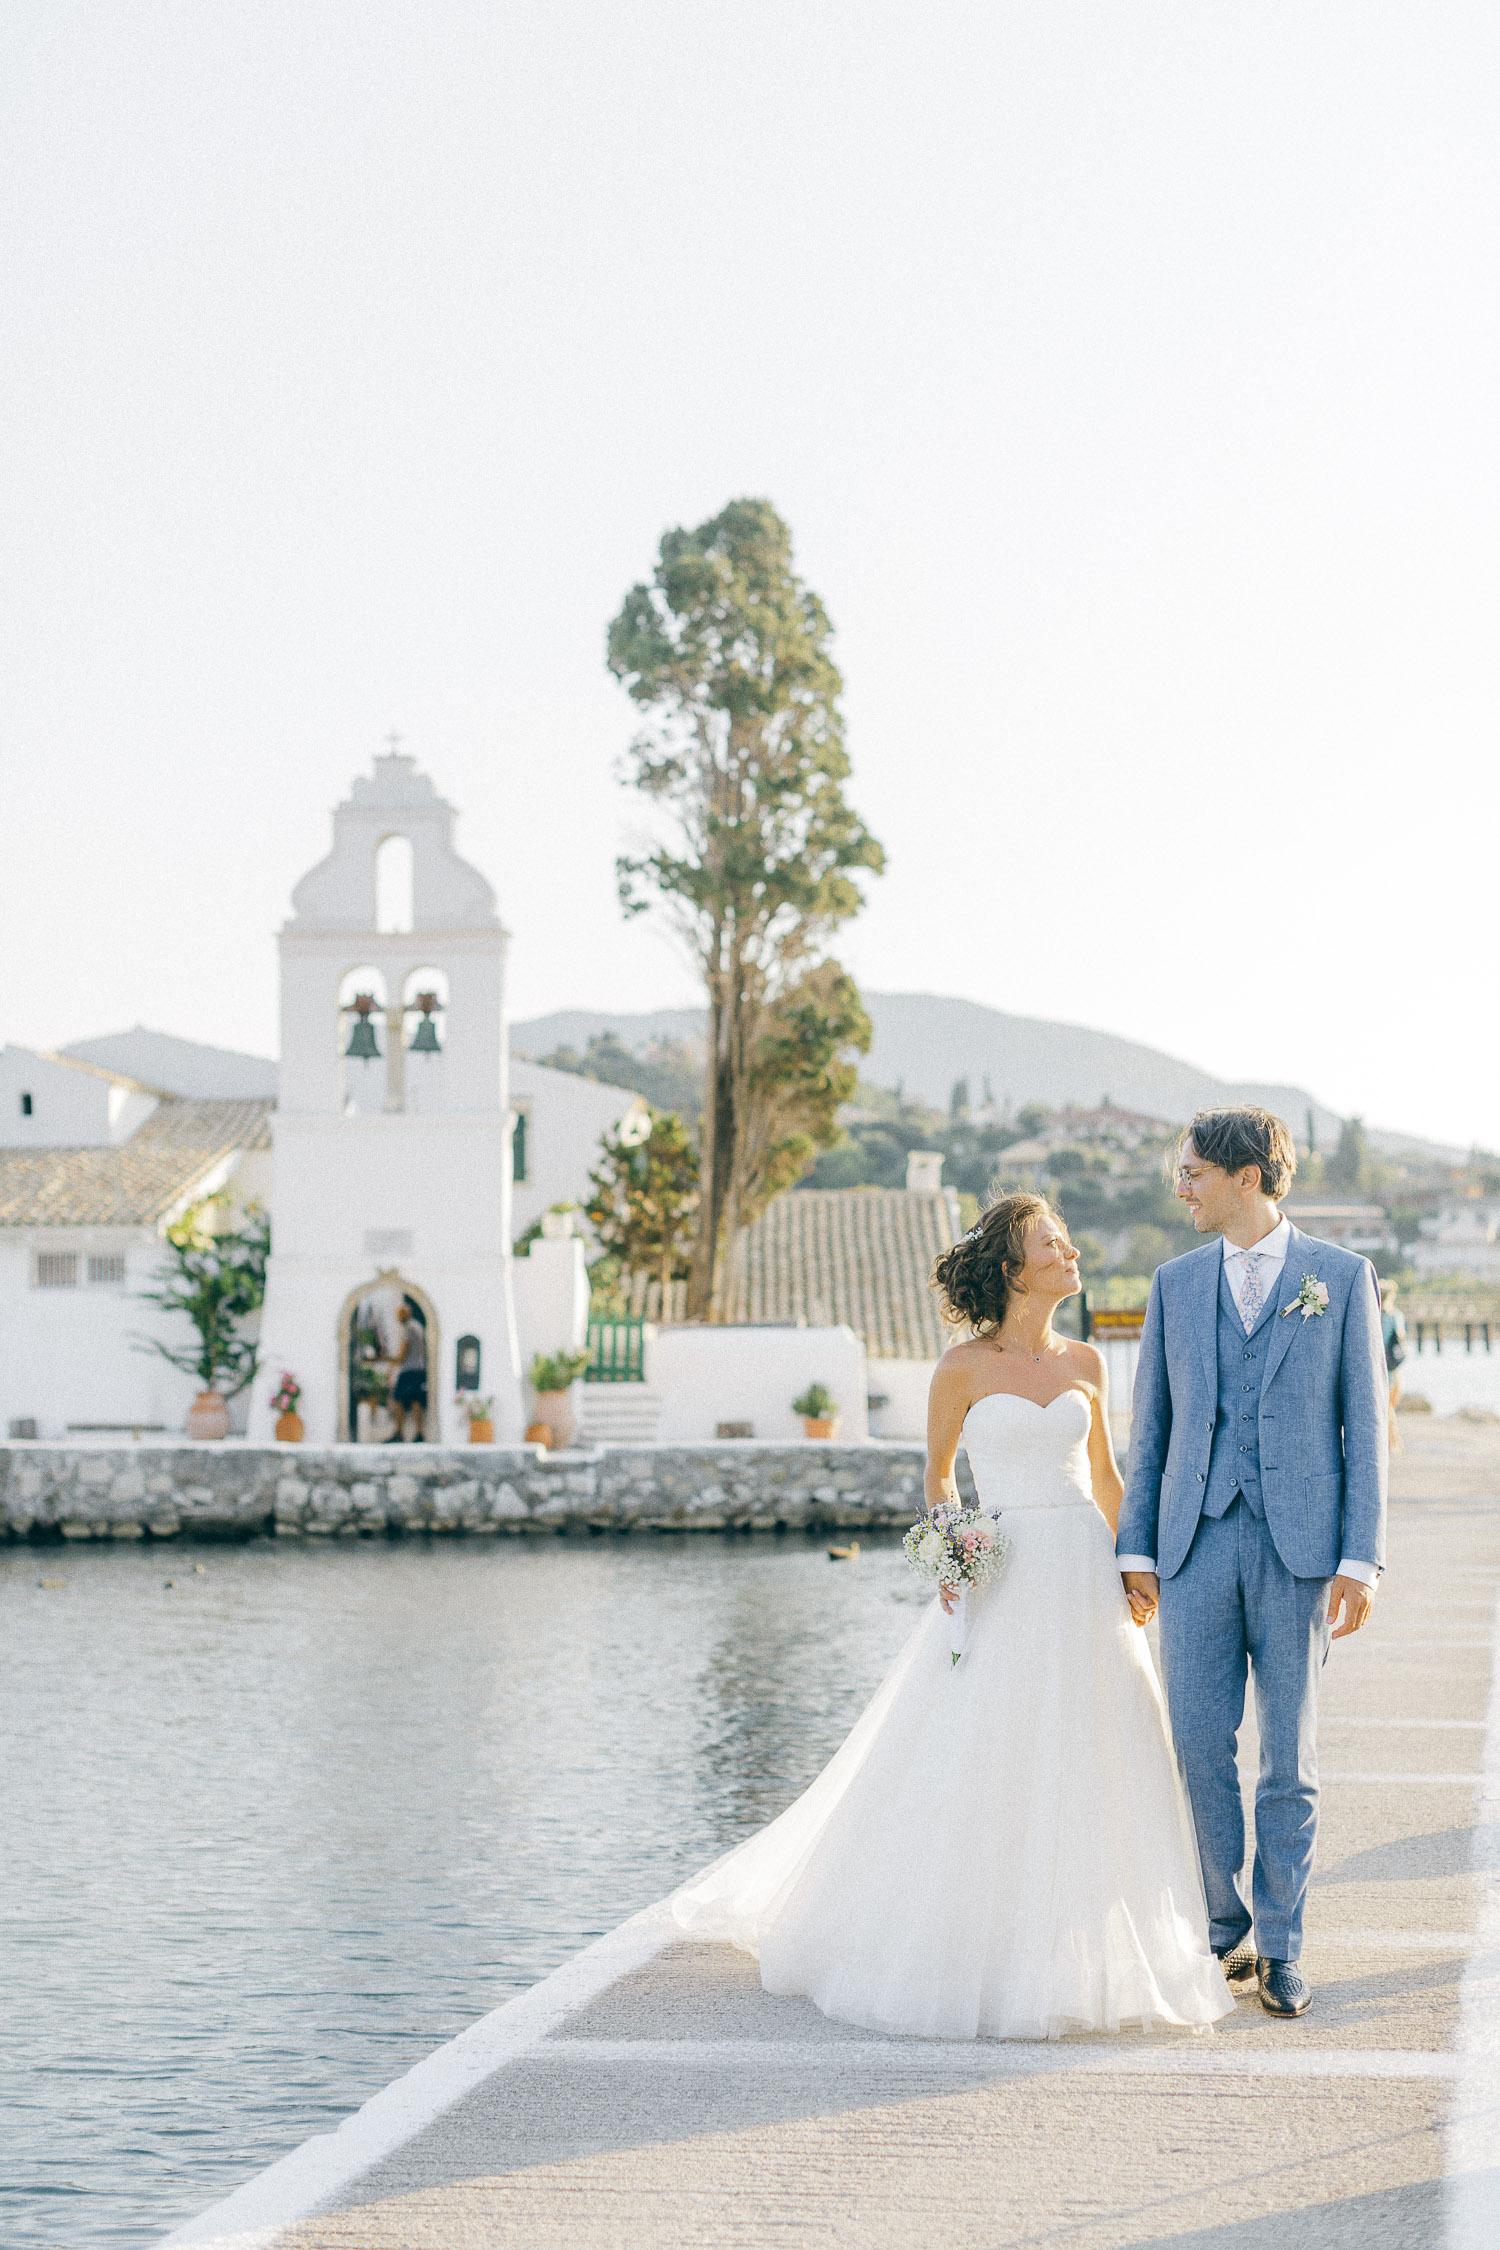 Bride and groom wedding ceremony exit at Old World micro wedding in Corfu Island